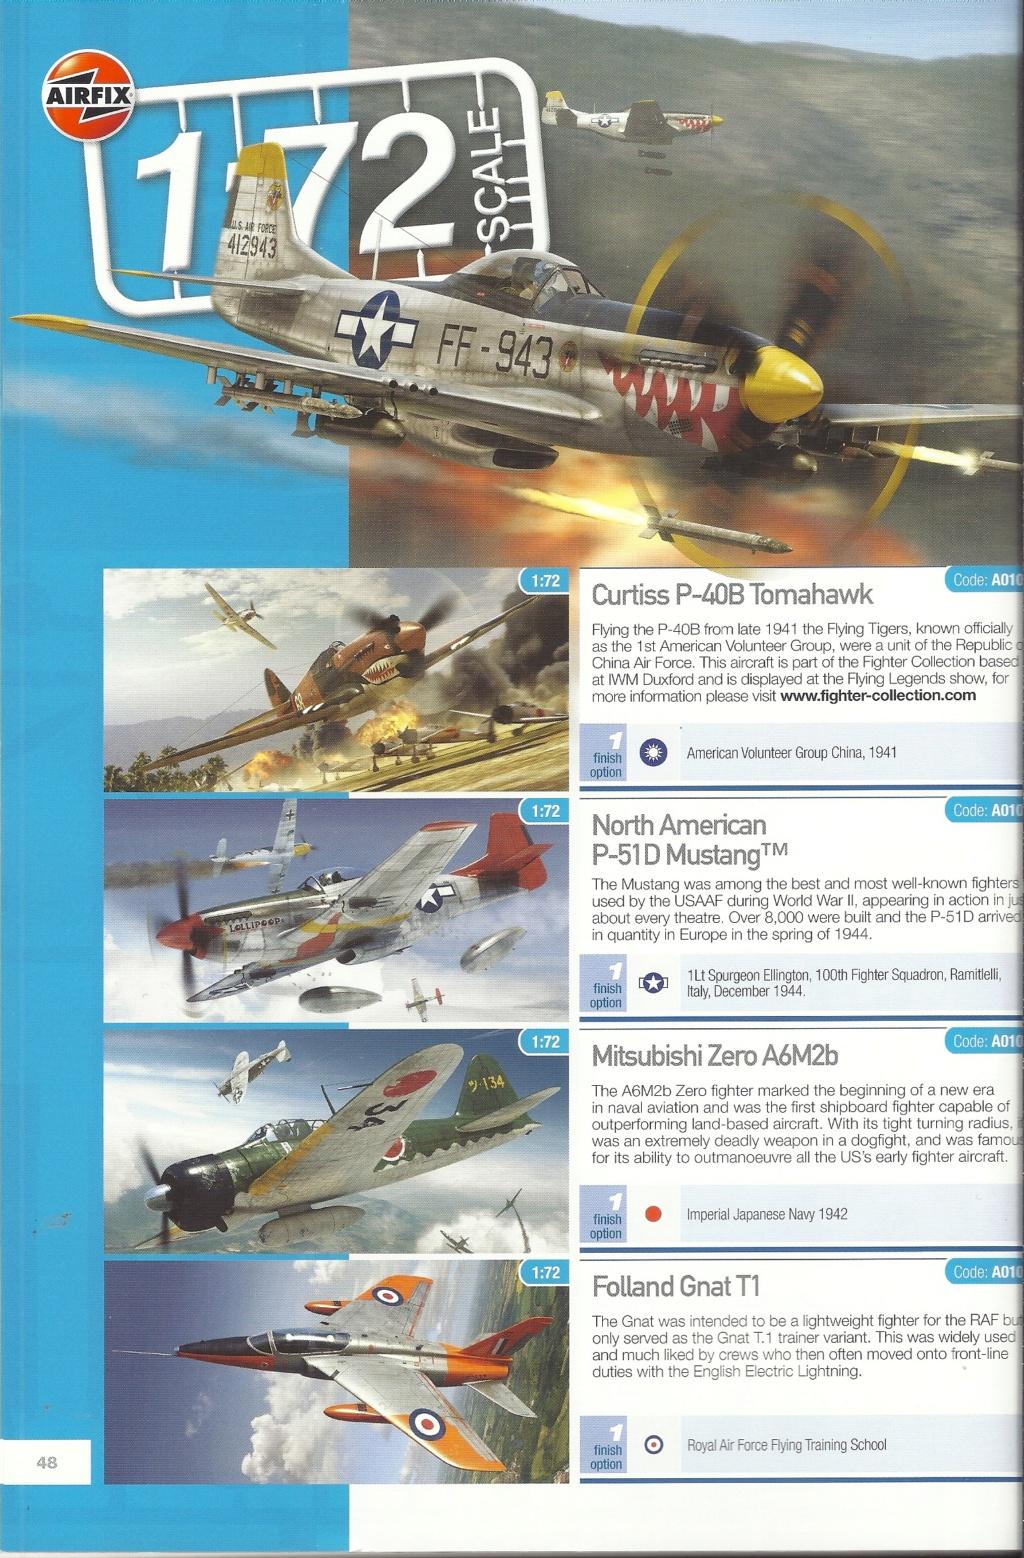 [AIRFIX 2013] Catalogue 2013 Airf1501